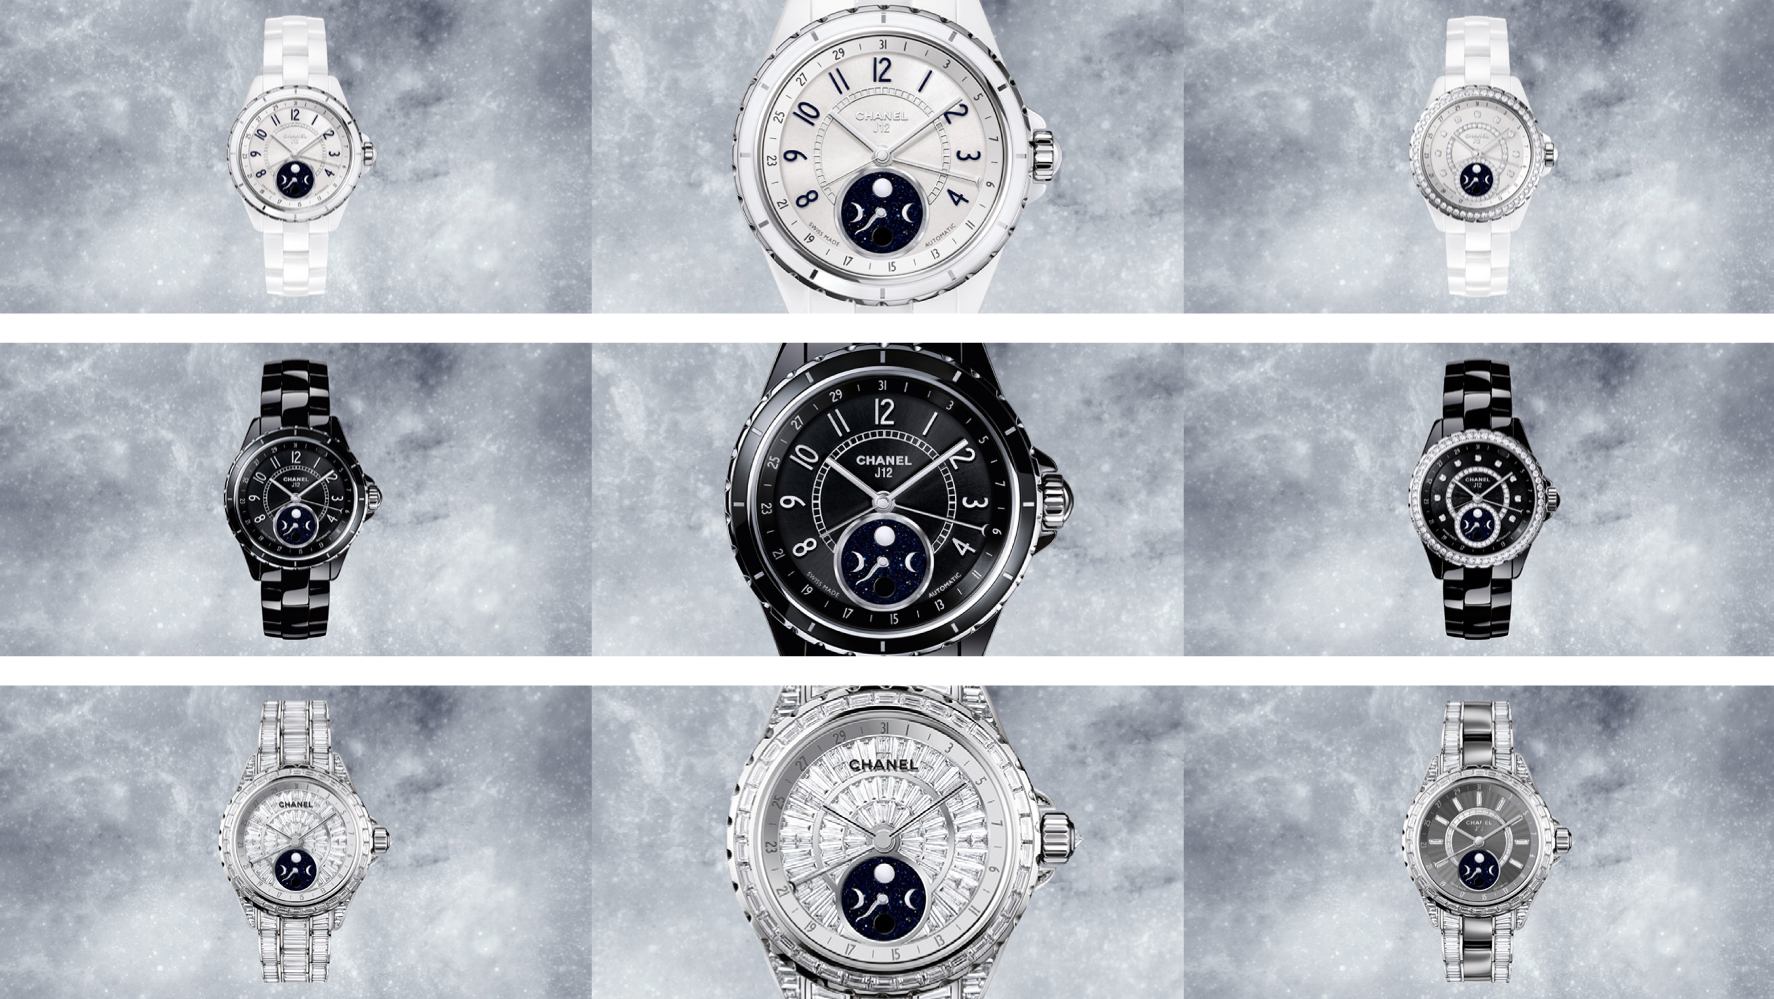 J12 Moonphase Chanel